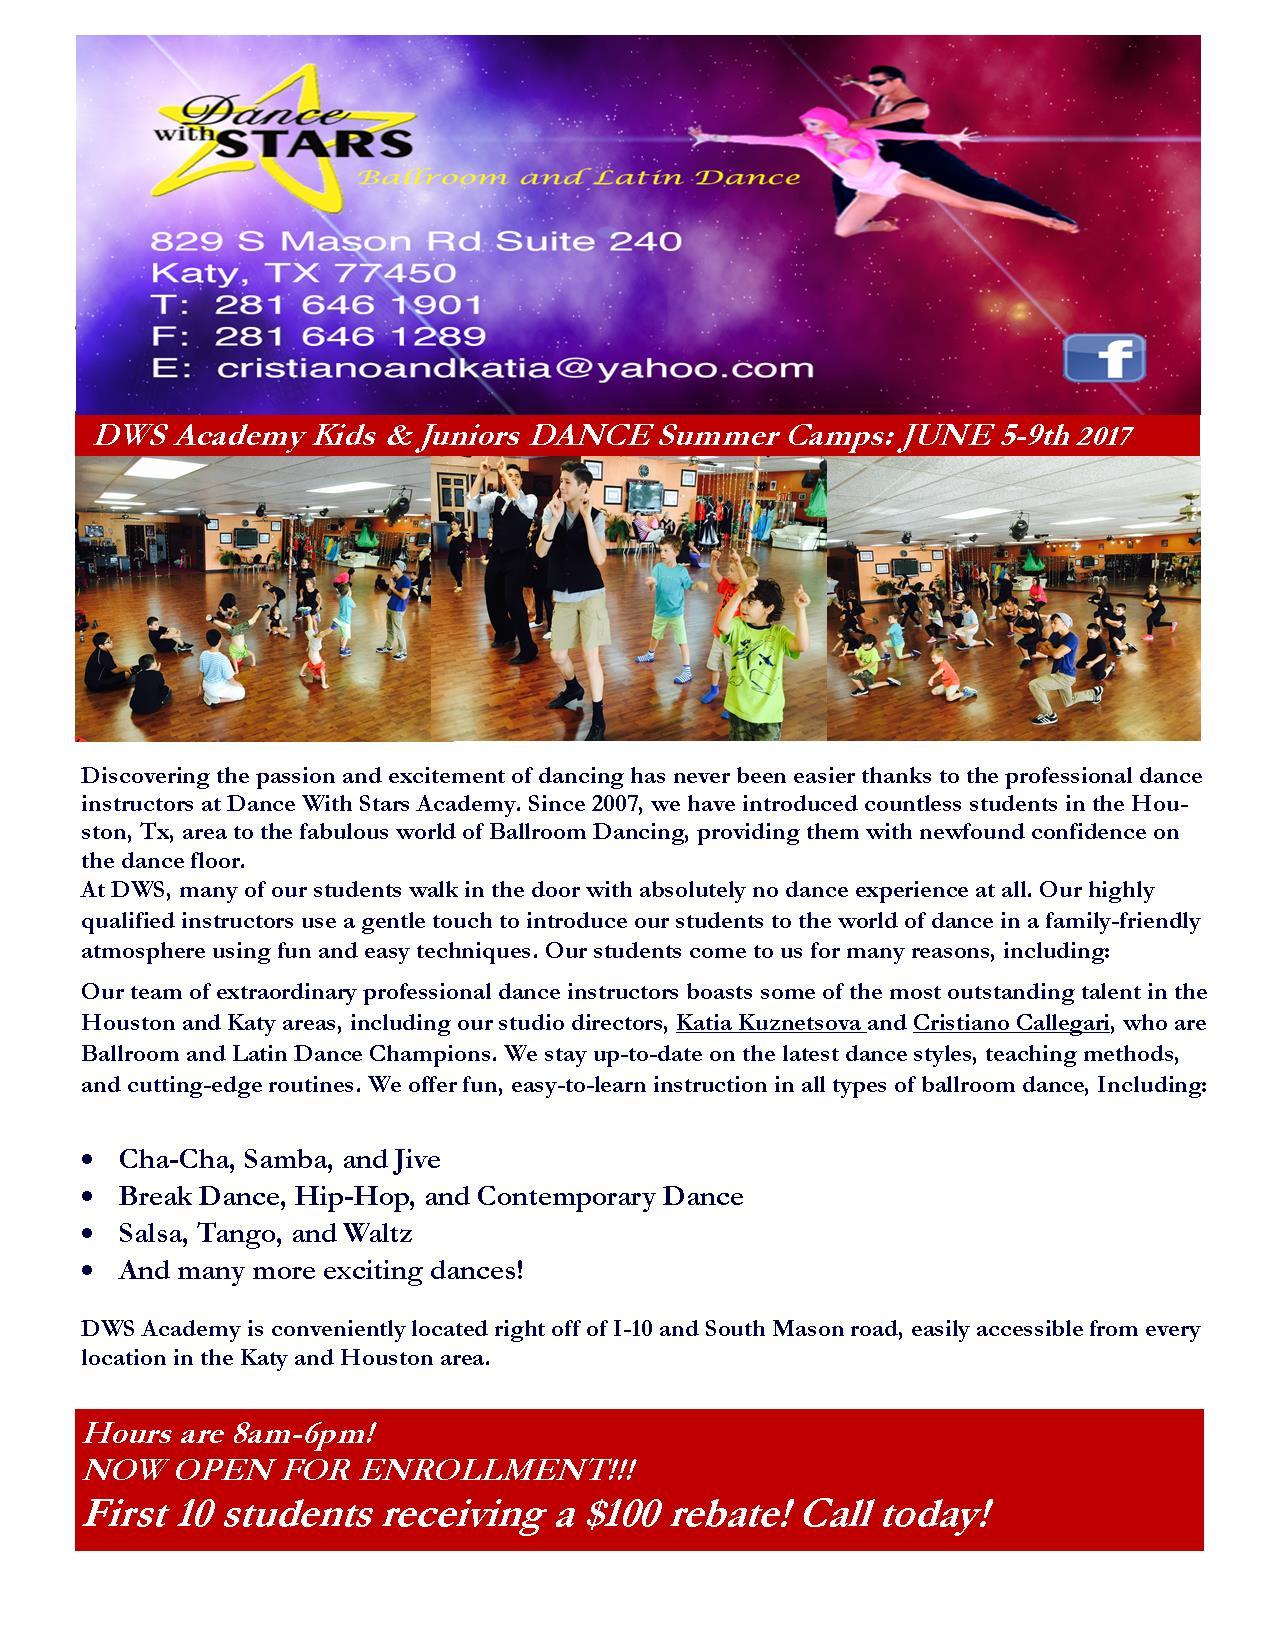 Kids, Juniors, Youth DANCE Summer Camp, JUNE 5th-9th 2017. $100 REBATE!!! CALL NOW: 281-646-1901